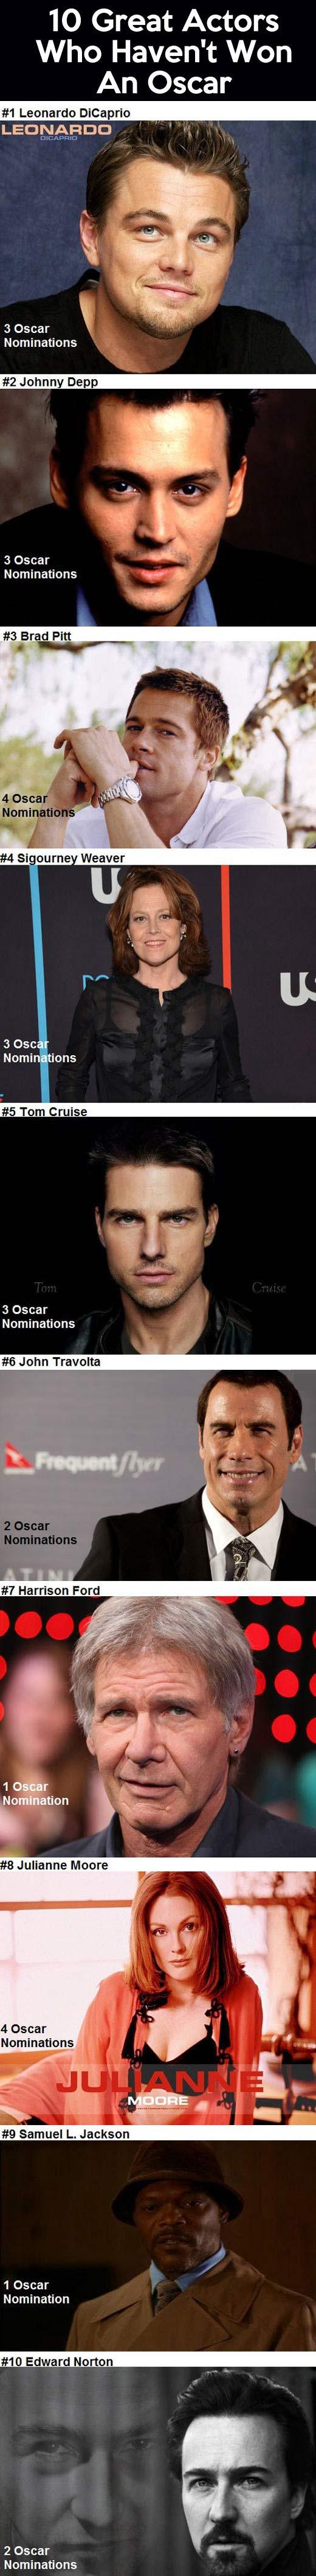 Actors who haven't won an Oscar…